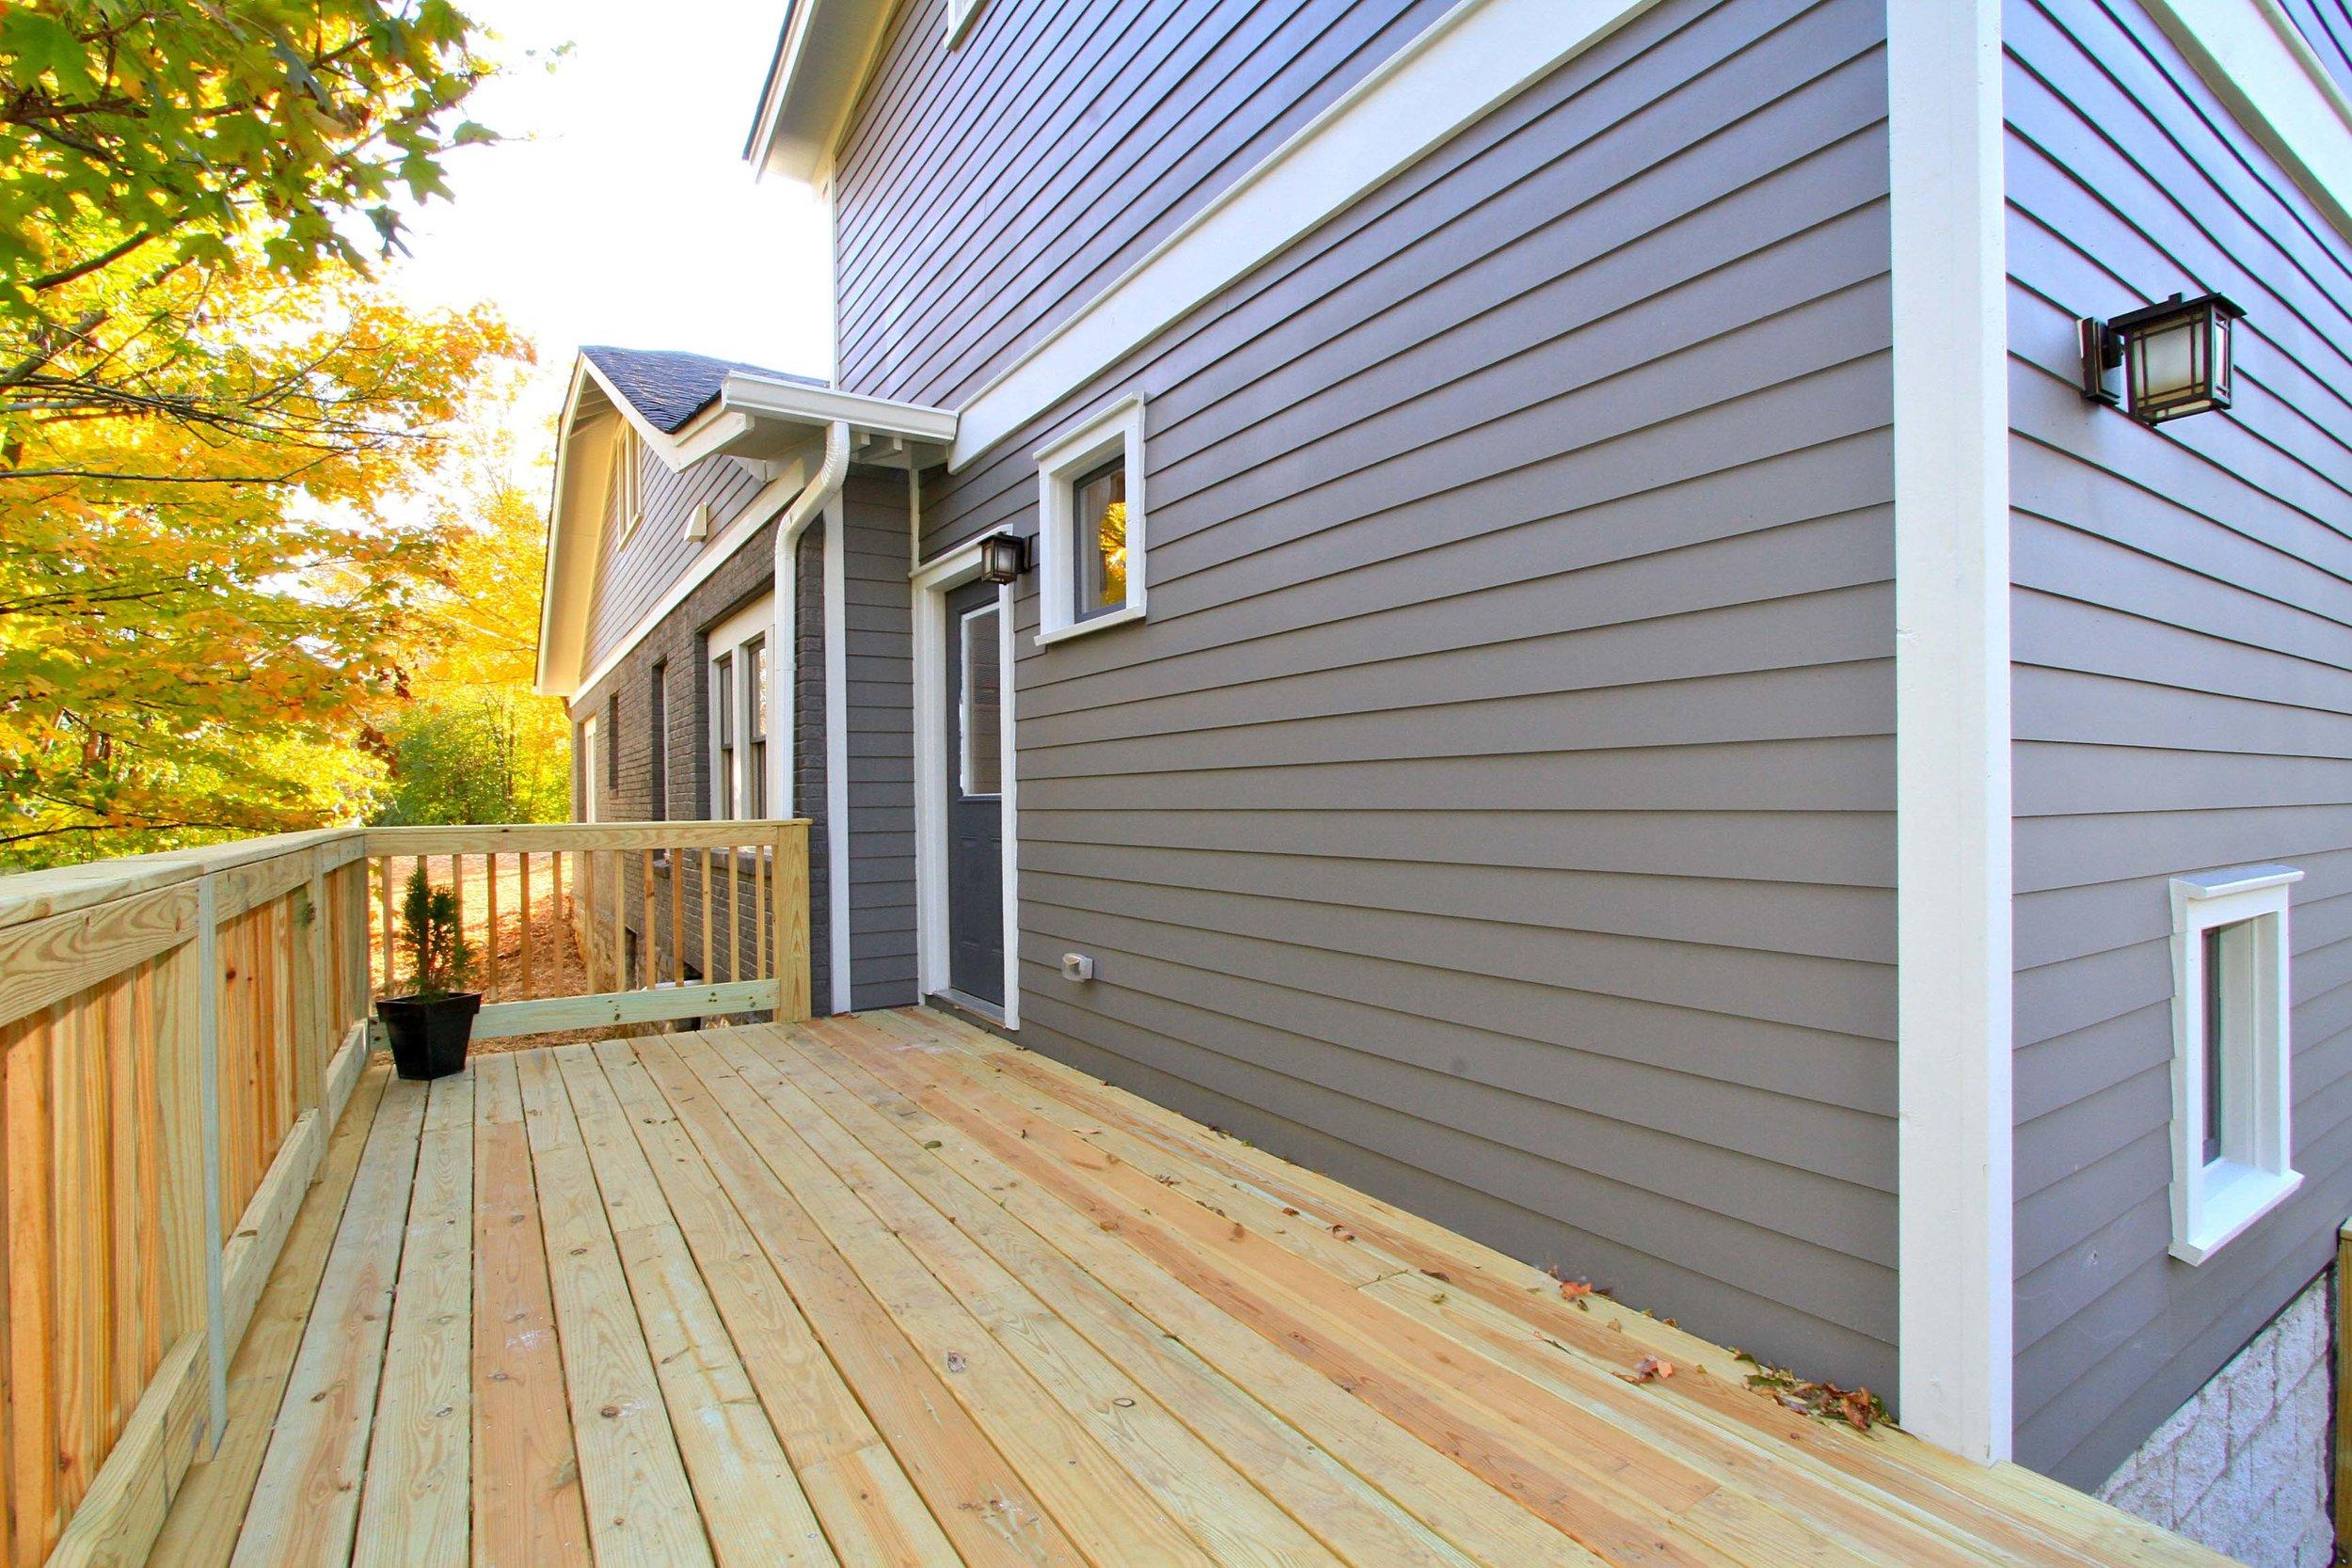 House-Plans-Online-Historic-Nashville-Peggy-Newman-Renovation-Deck-Murphy.jpg